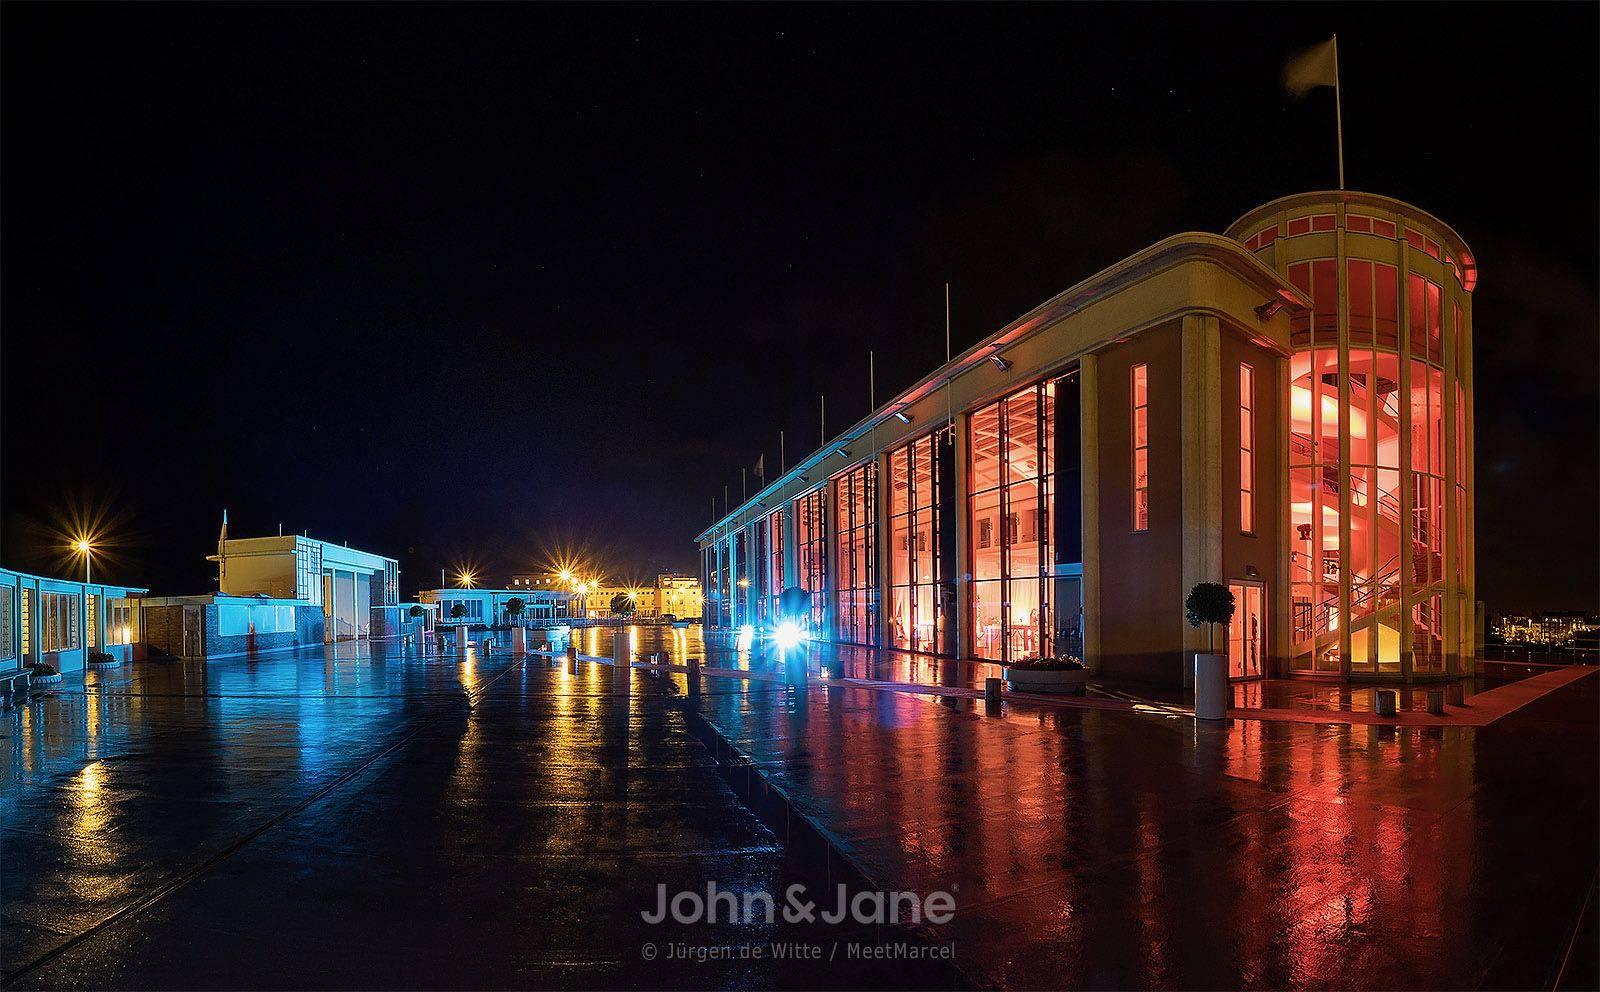 John & Jane - House of Weddings - 5